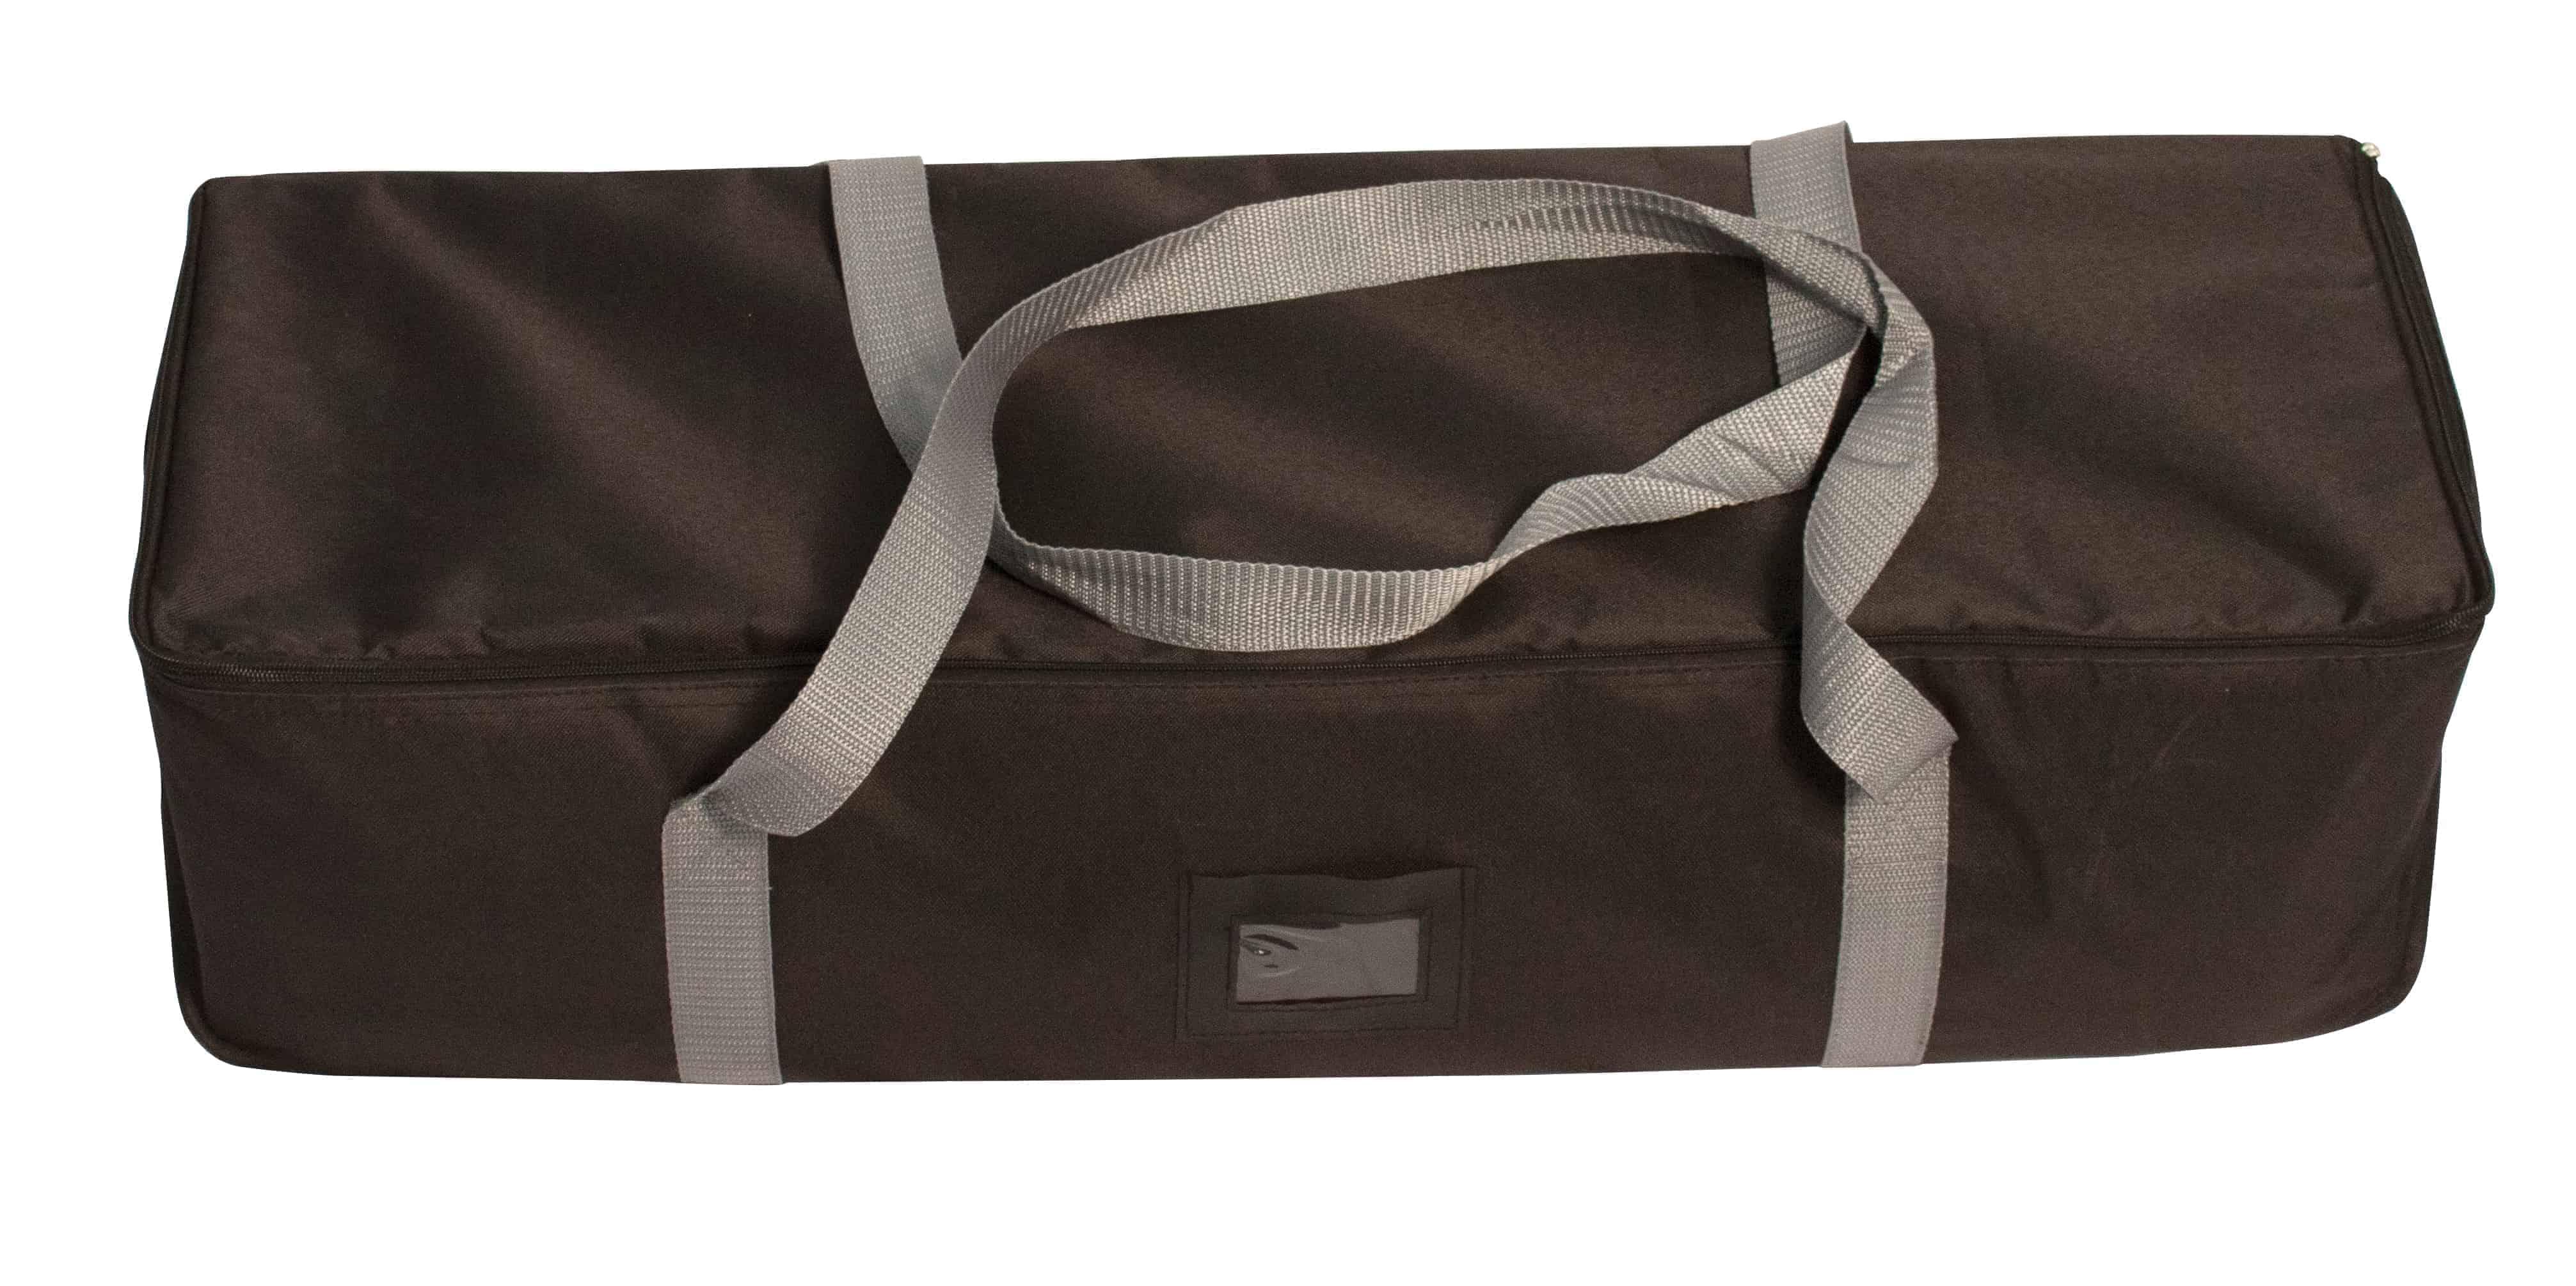 41 Embrace Eco Bag High Res   Fantasy Prints